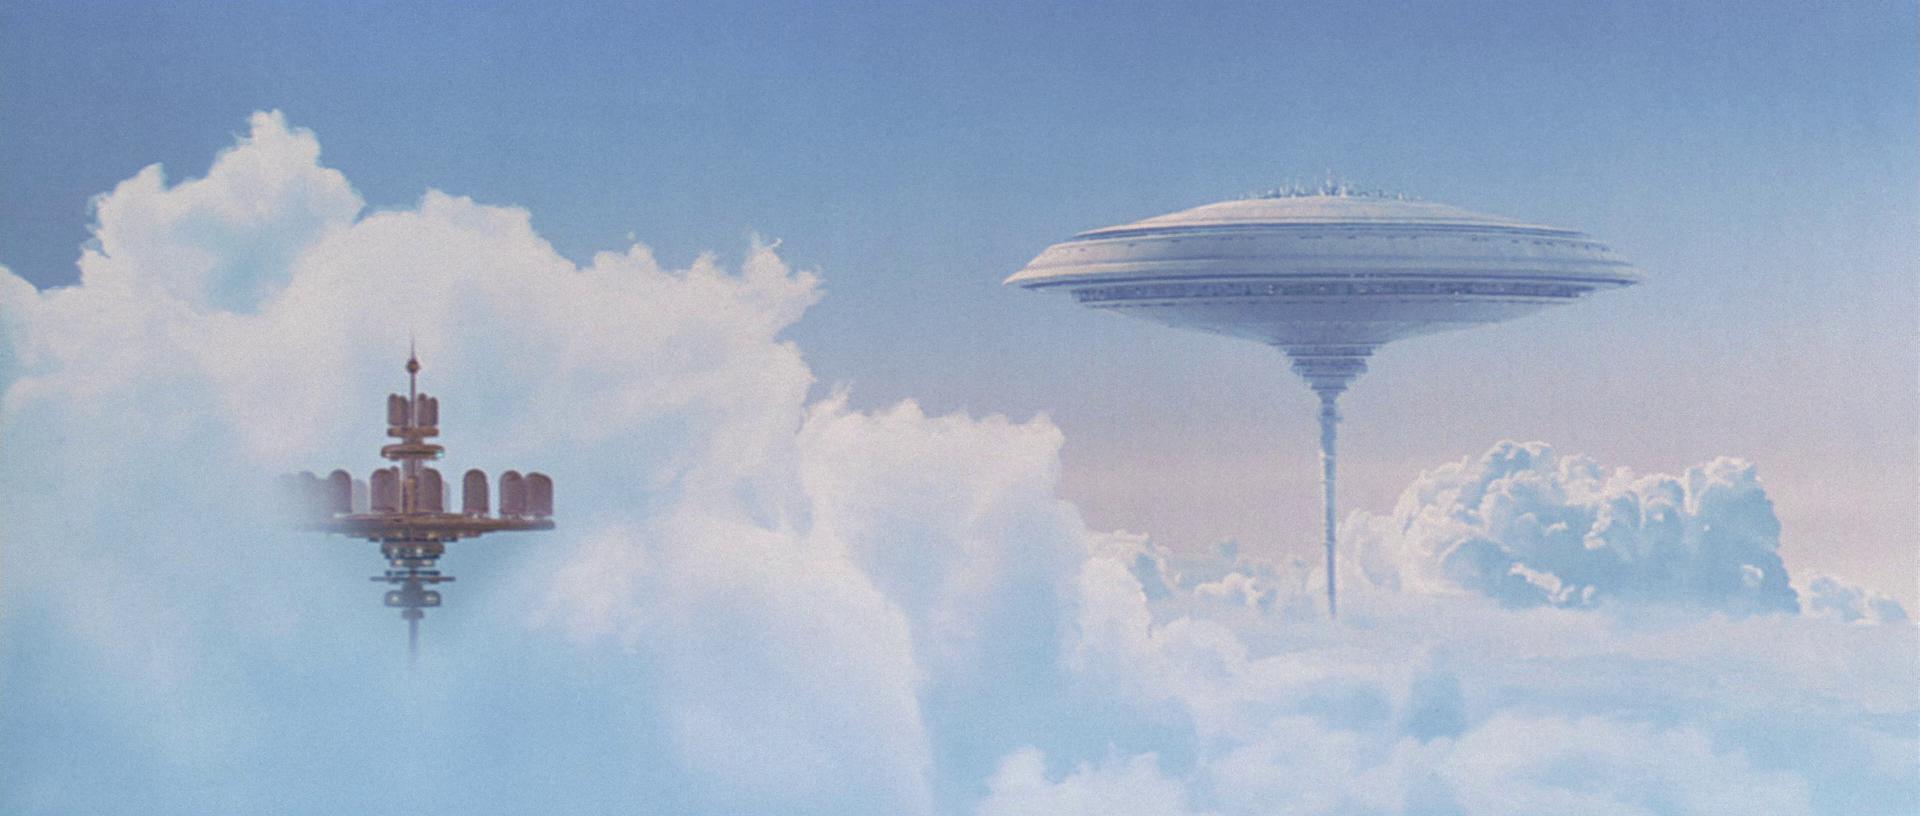 !!!!! STAR WARS !!!! : THE FORCE AWAKENS (december 2015)   Cloud_City